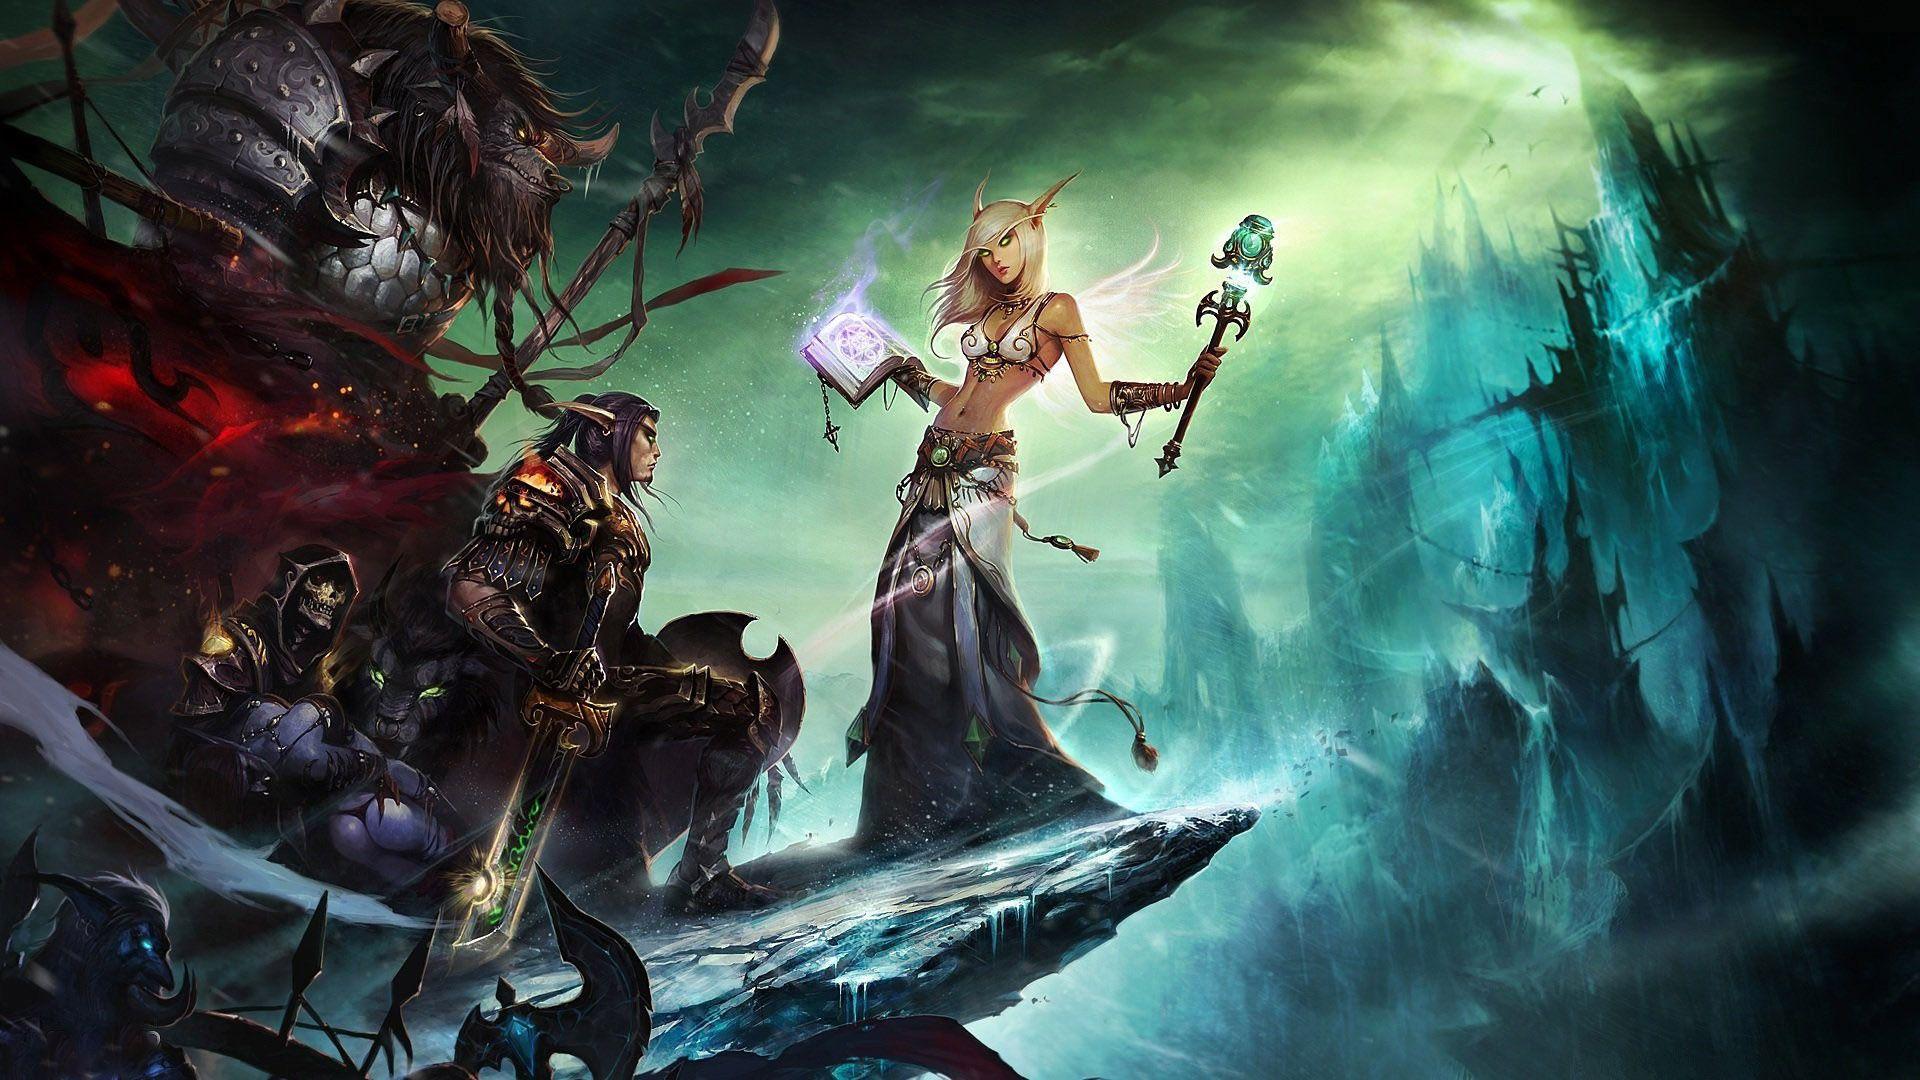 Animated Wallpaper Windows 10 World Of Warcraft